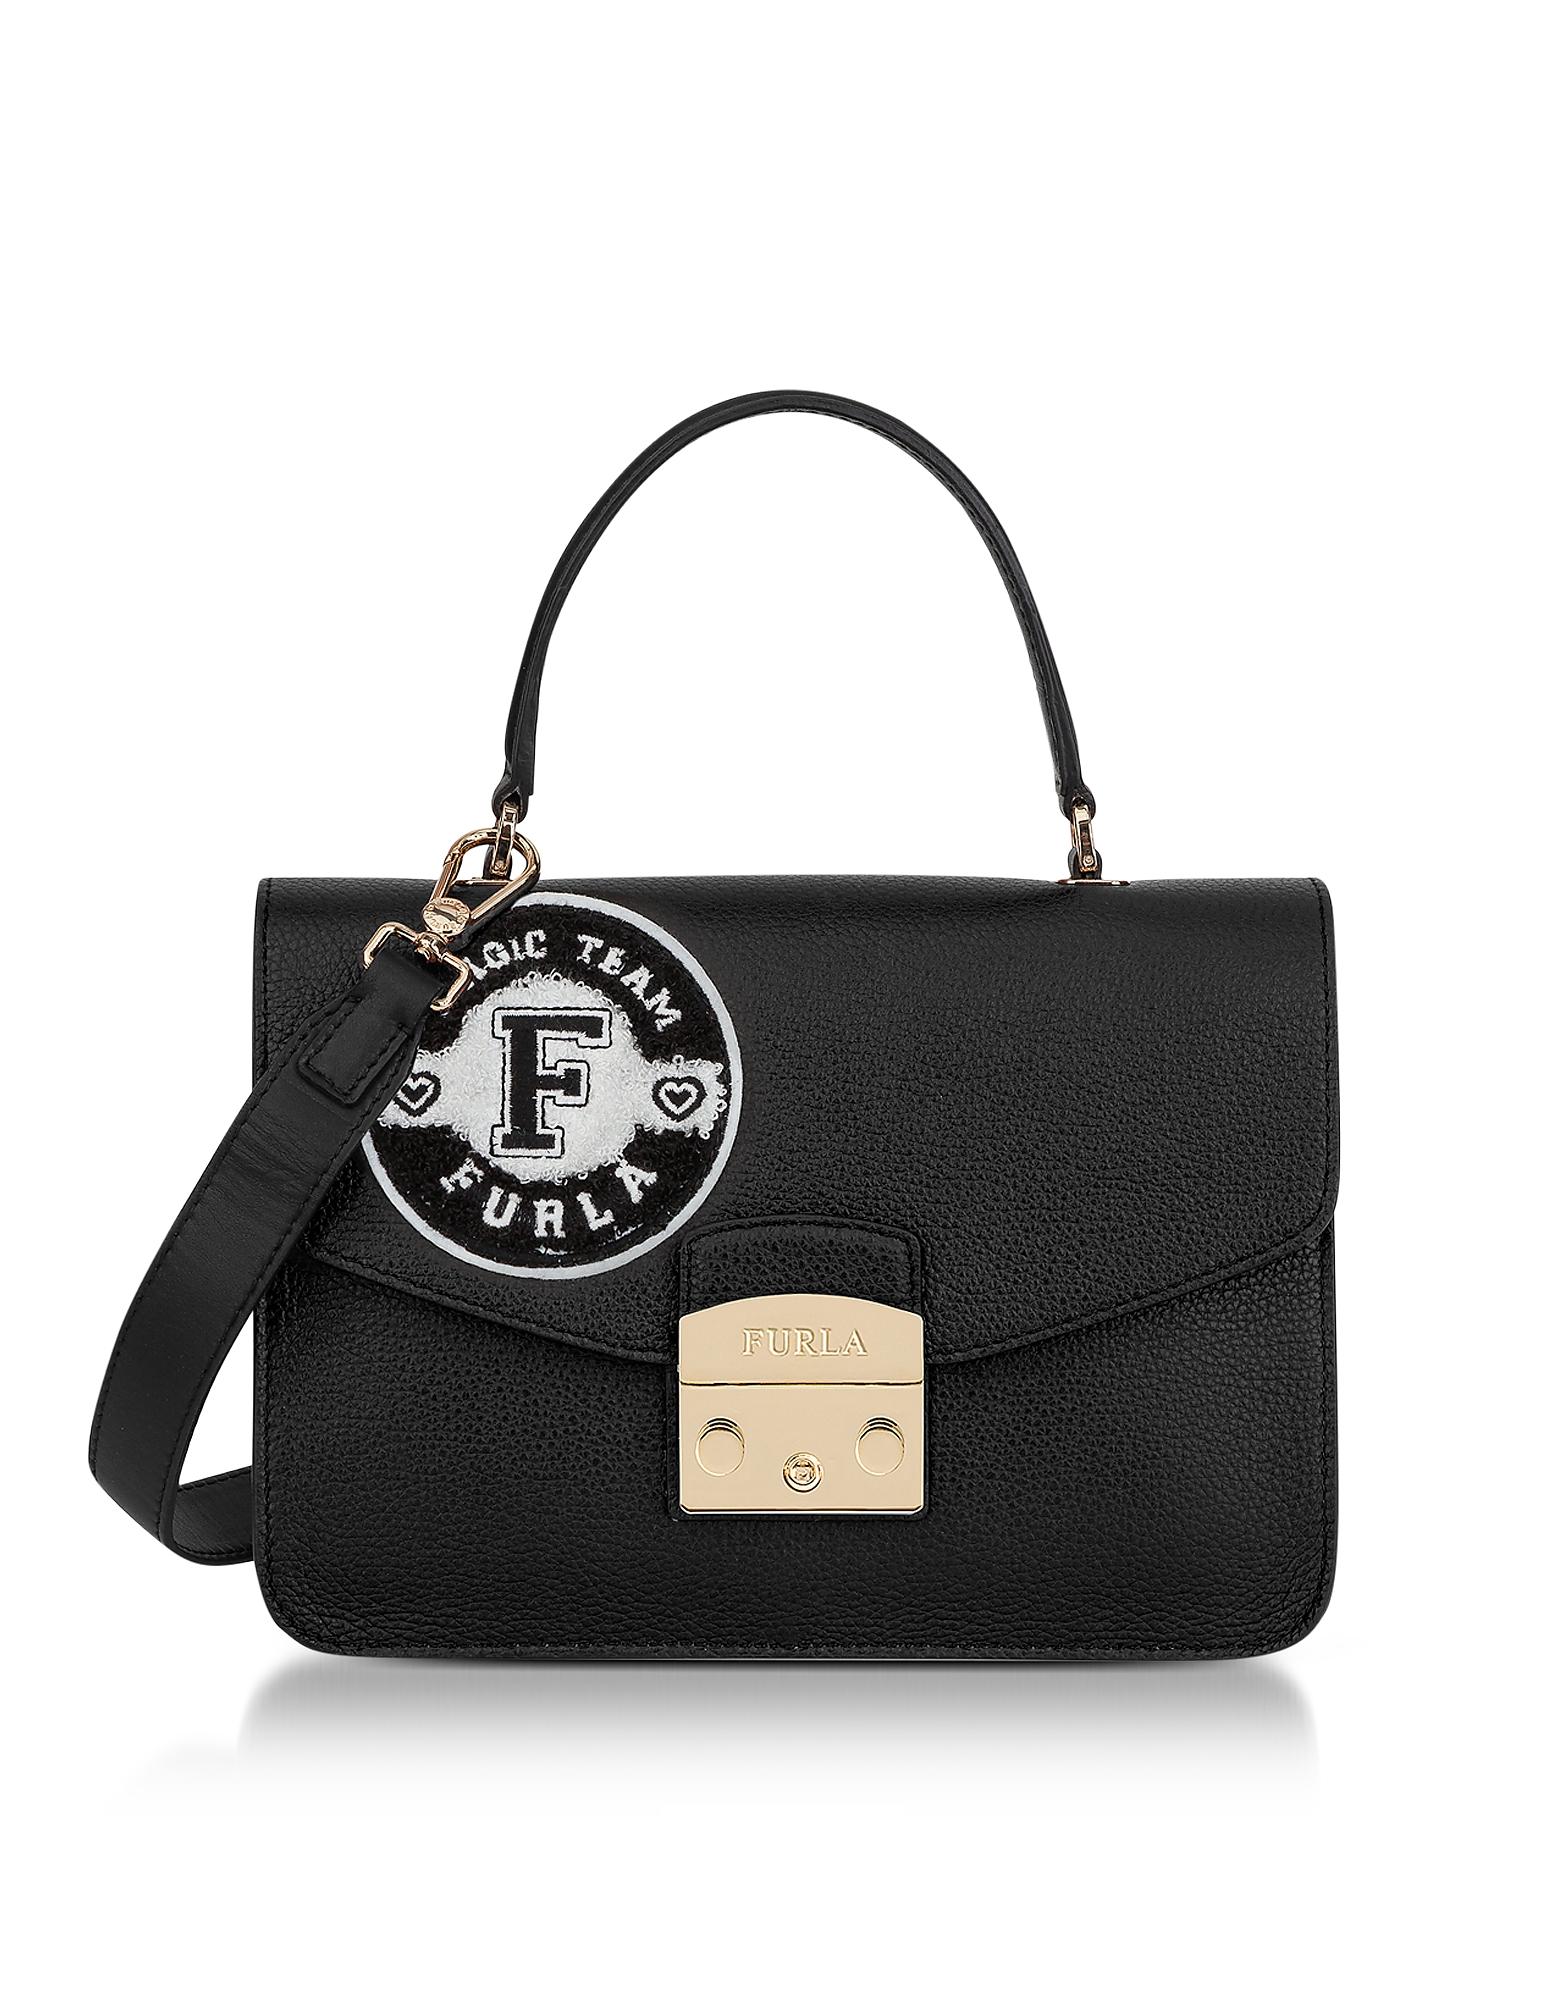 Furla Handbags, Onyx and Petalo Leather Metropolis Post Small Top Handle Bag